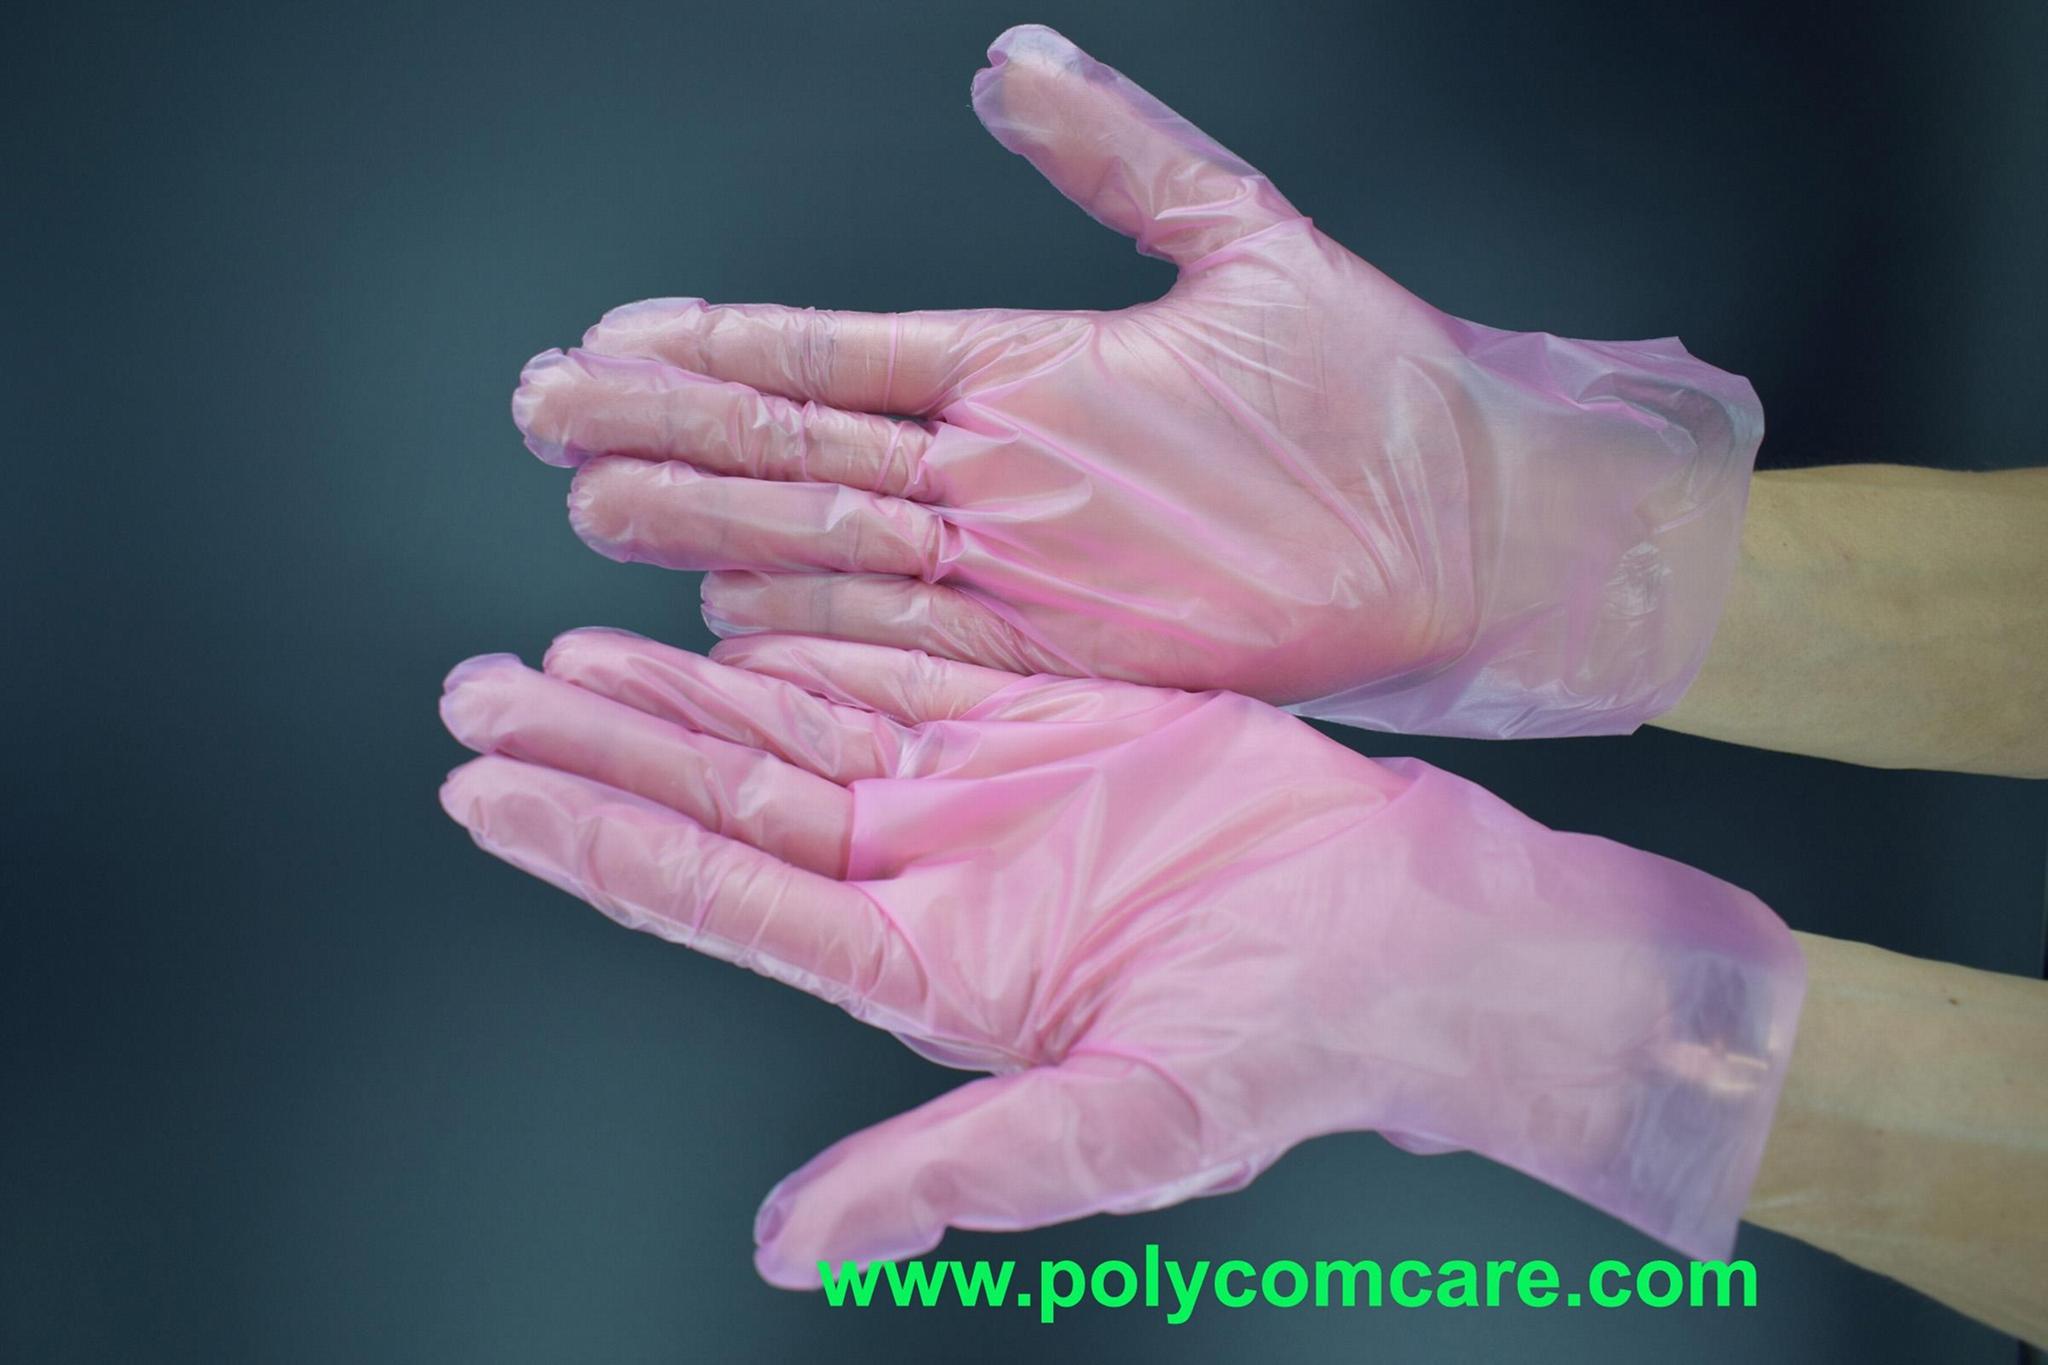 Thermoplastic Elastomer (TPE) Glove 6